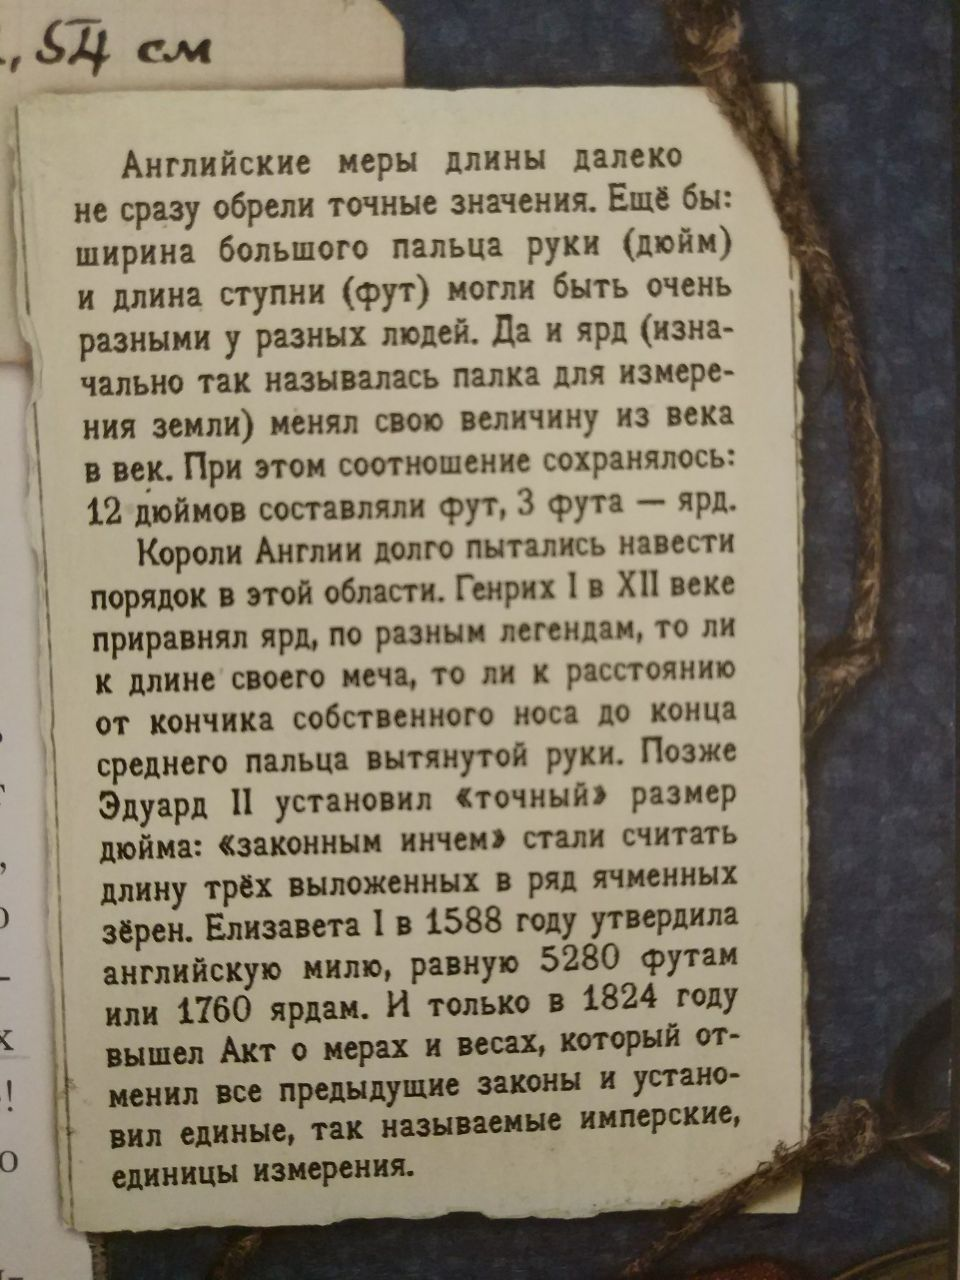 http://s7.uploads.ru/GQuPB.jpg